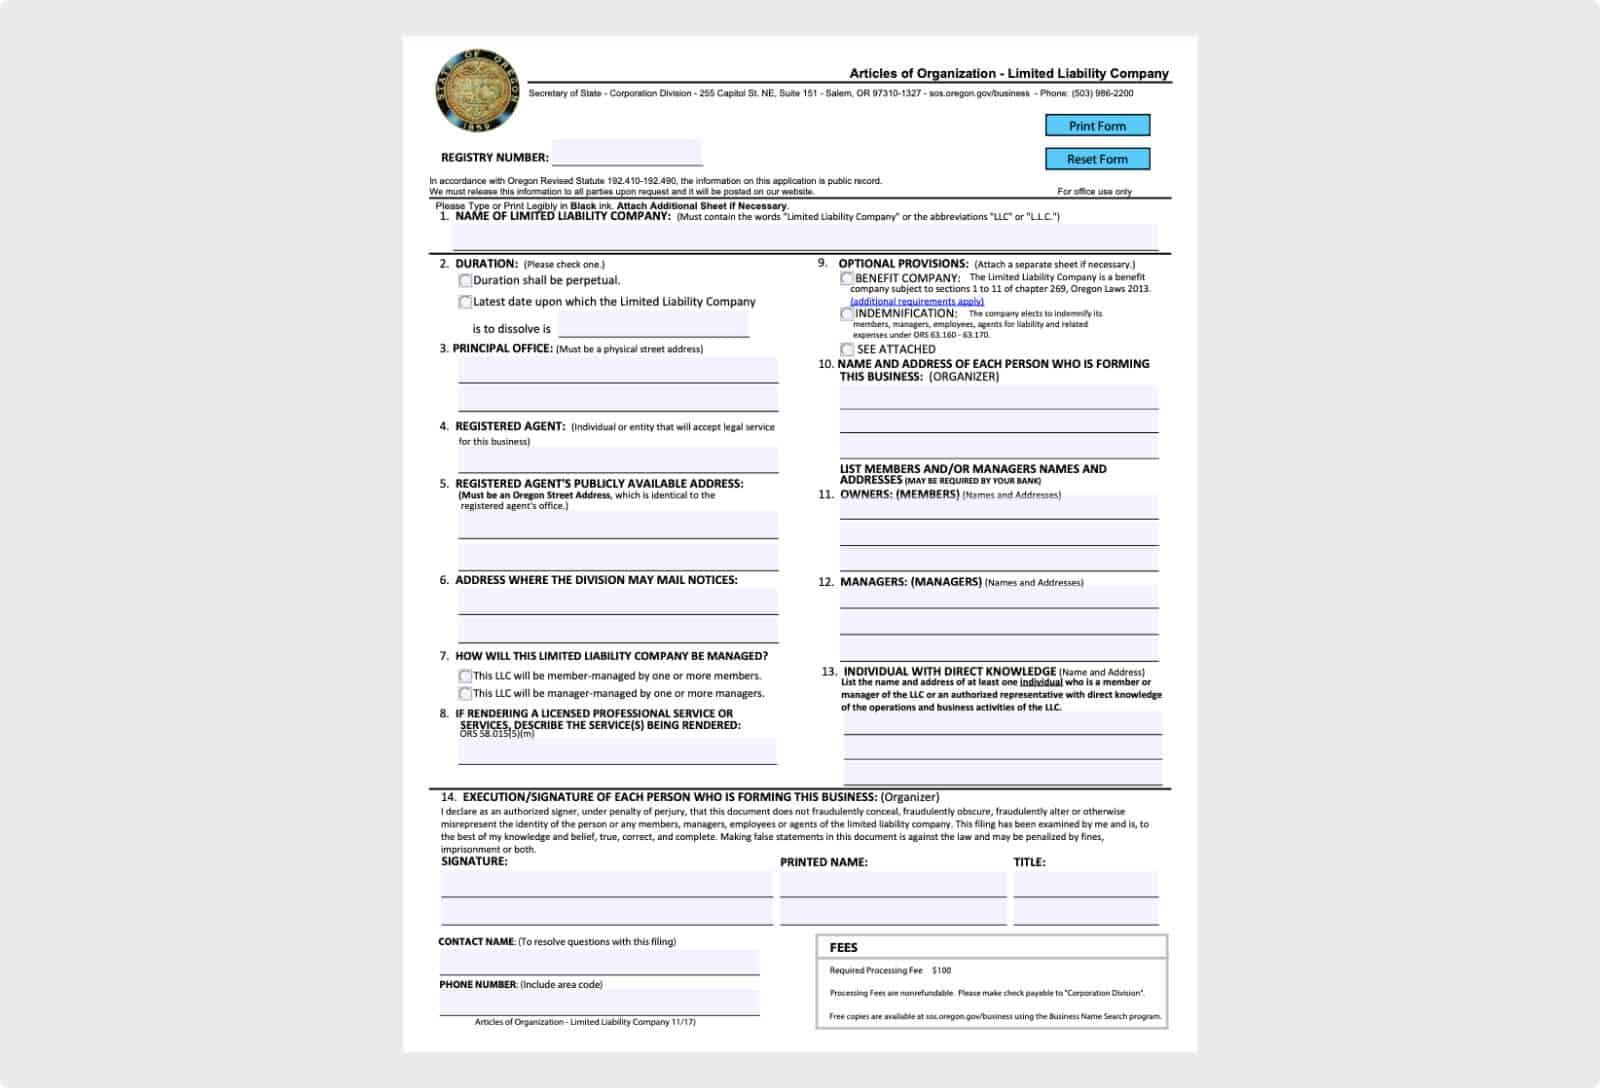 Oregon Articles of Organization filing form